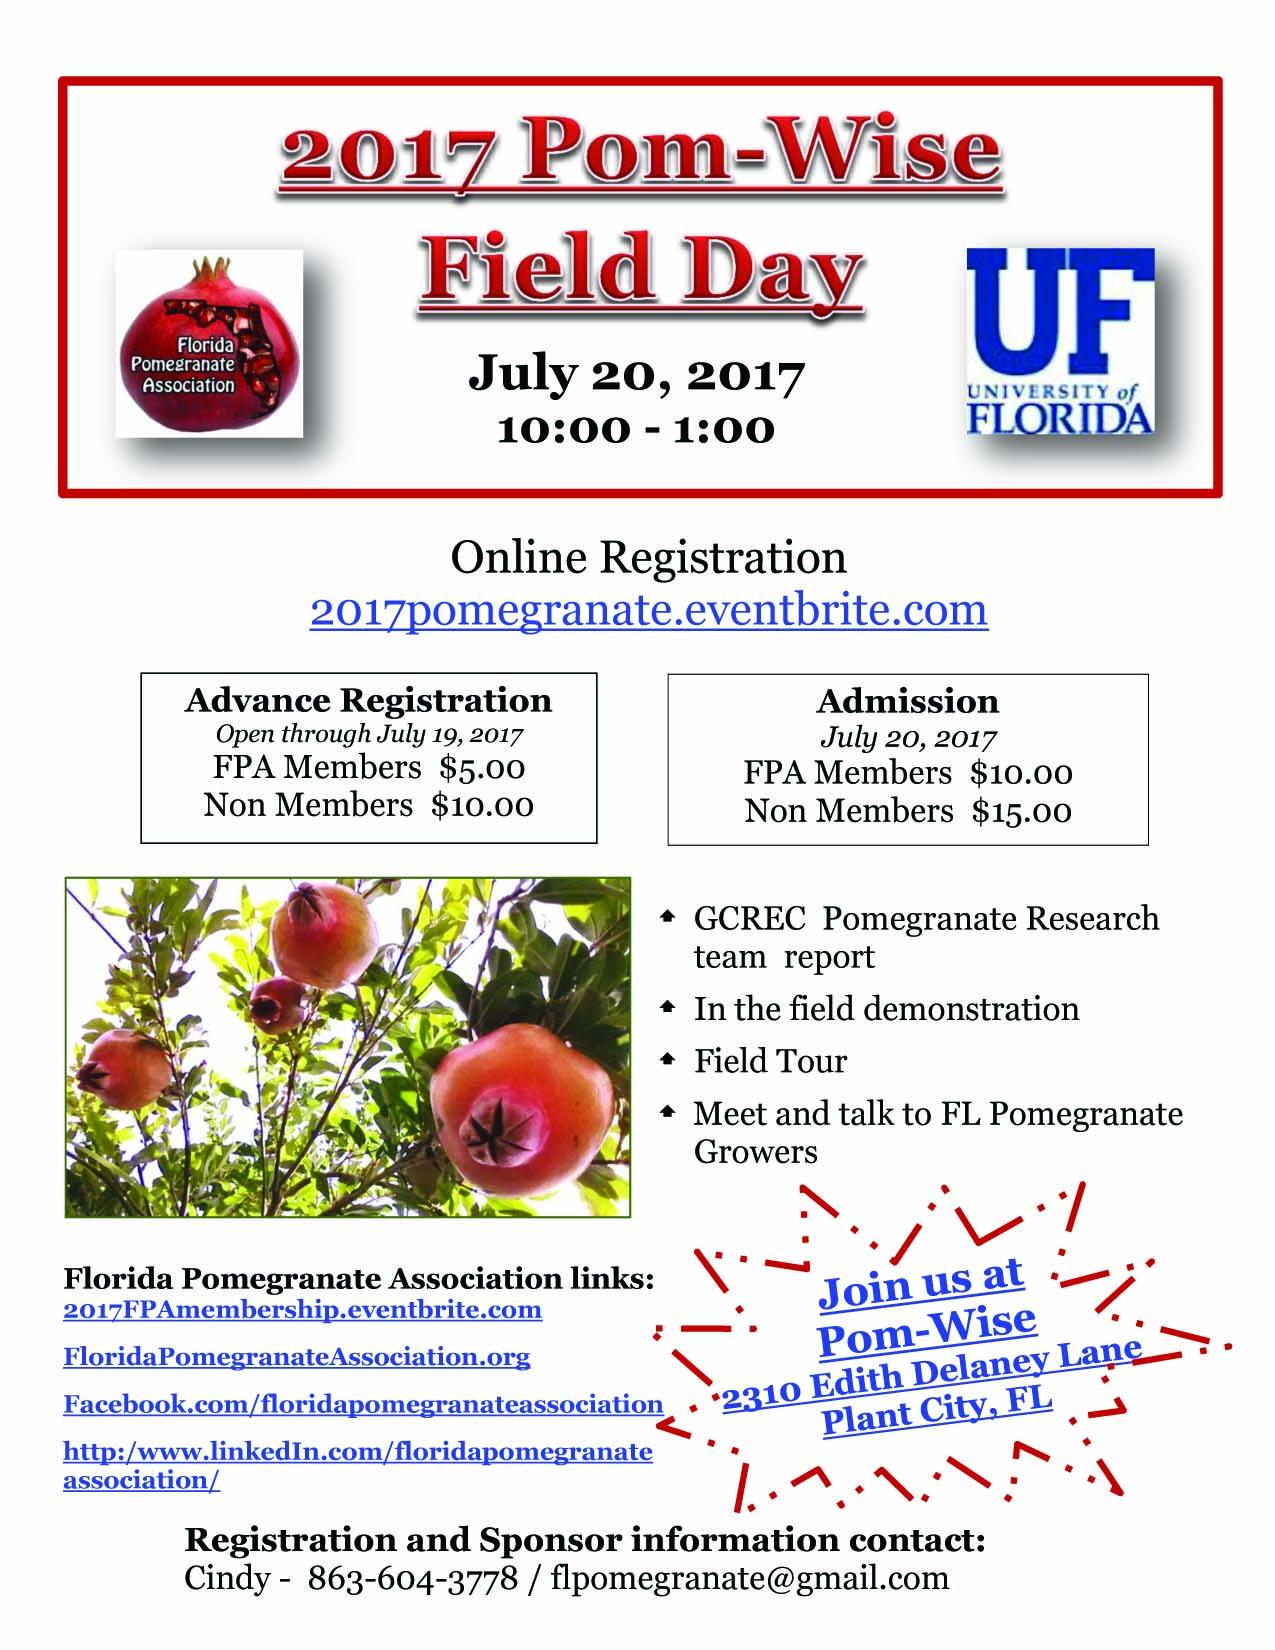 2017 Pom-Wise Field Day flyer